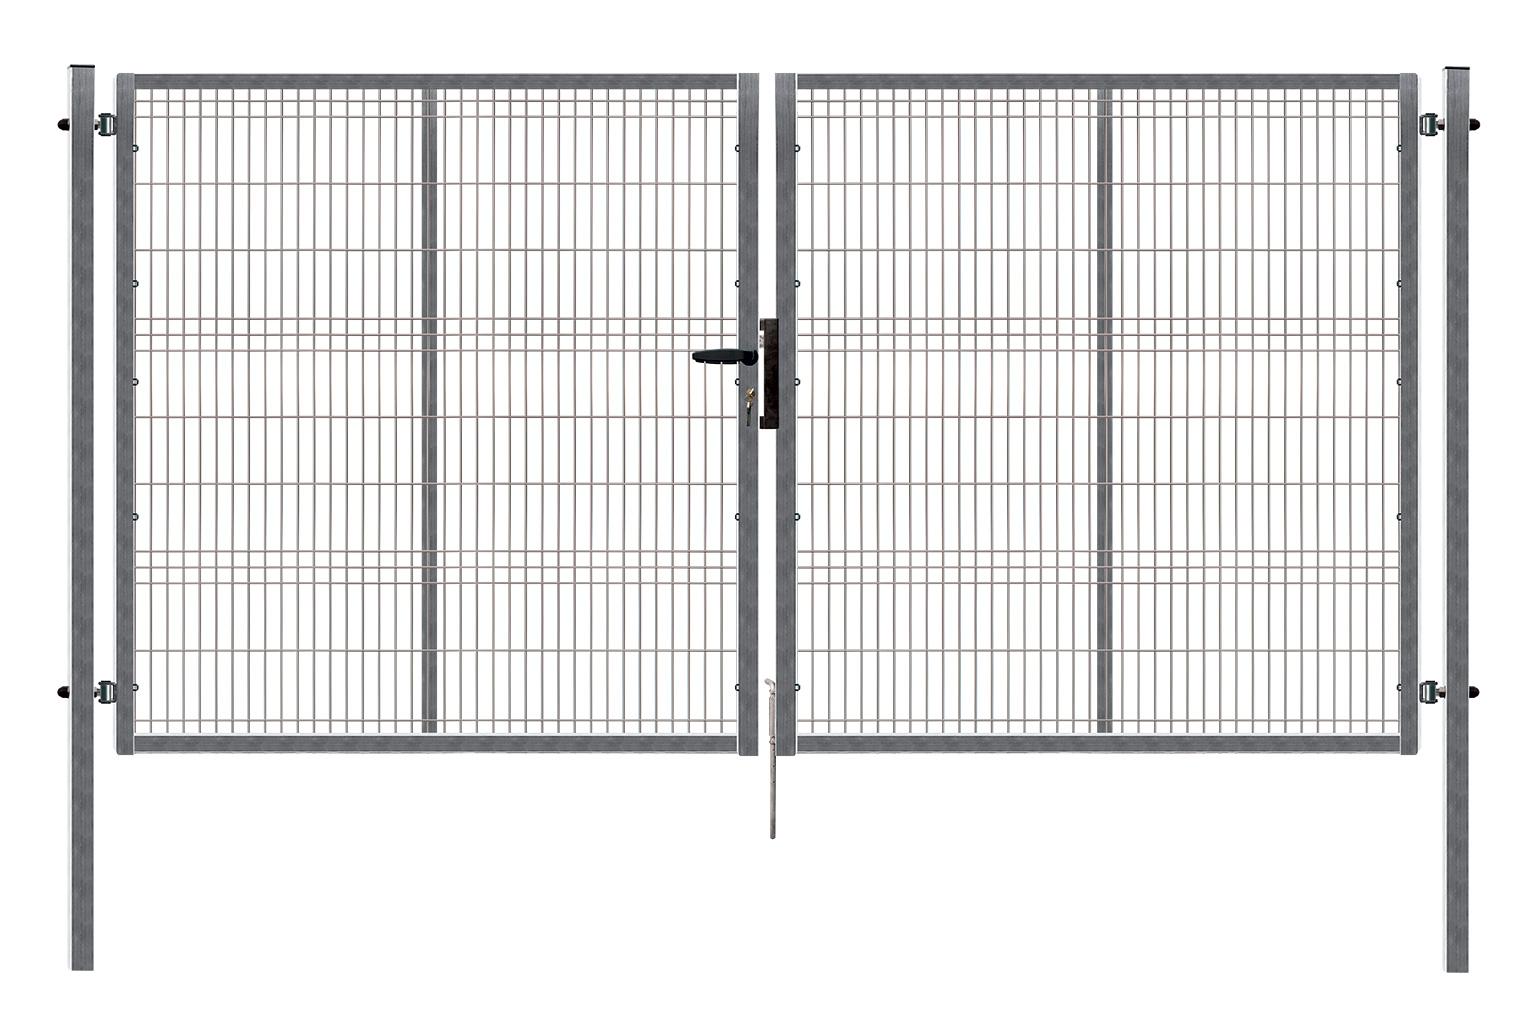 Brána PILOFOR dvoukřídlá, 4118x1245 mm, Zn 49,5Kg